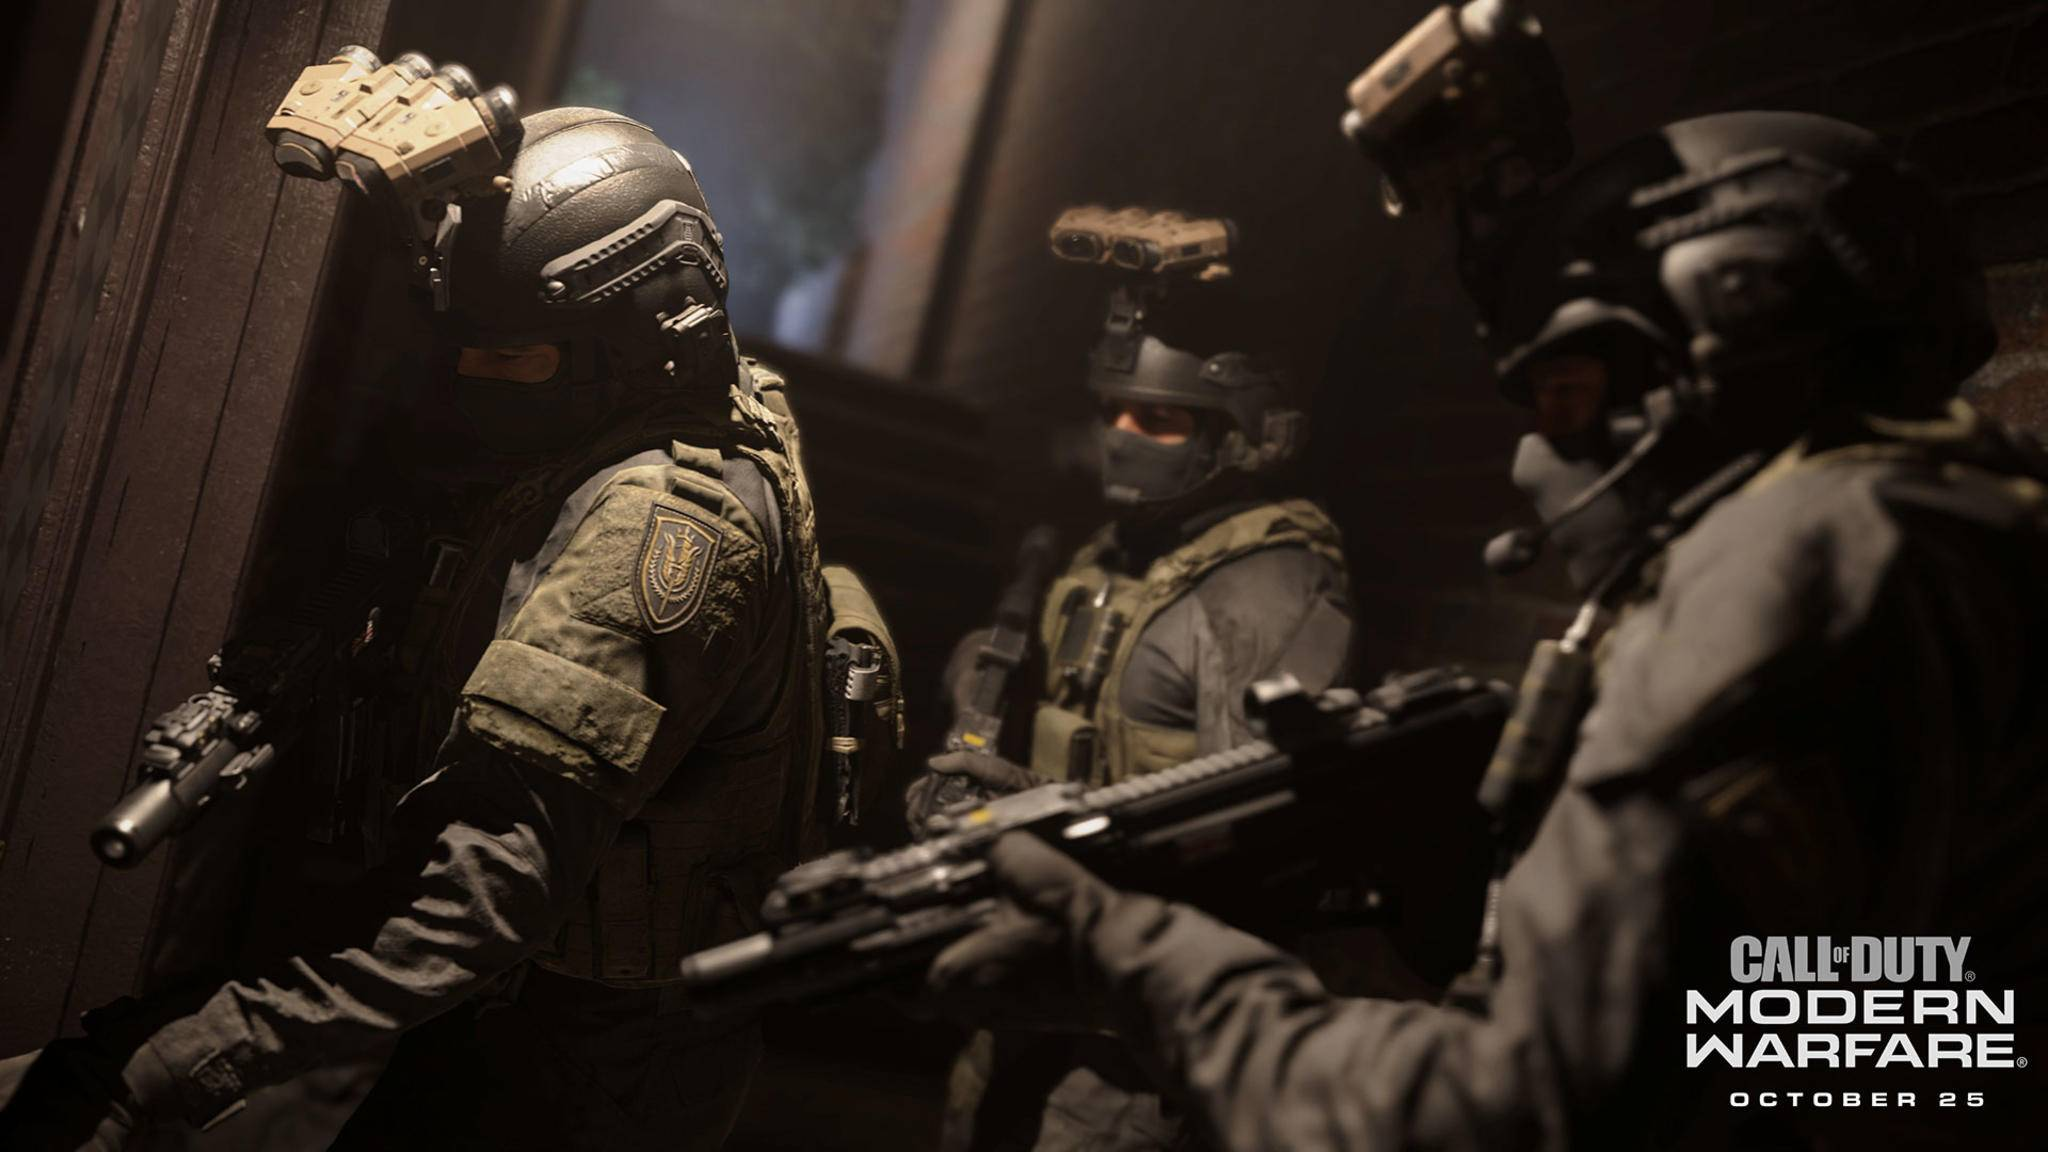 call-of-duty-modern-warfare-reveal (2)